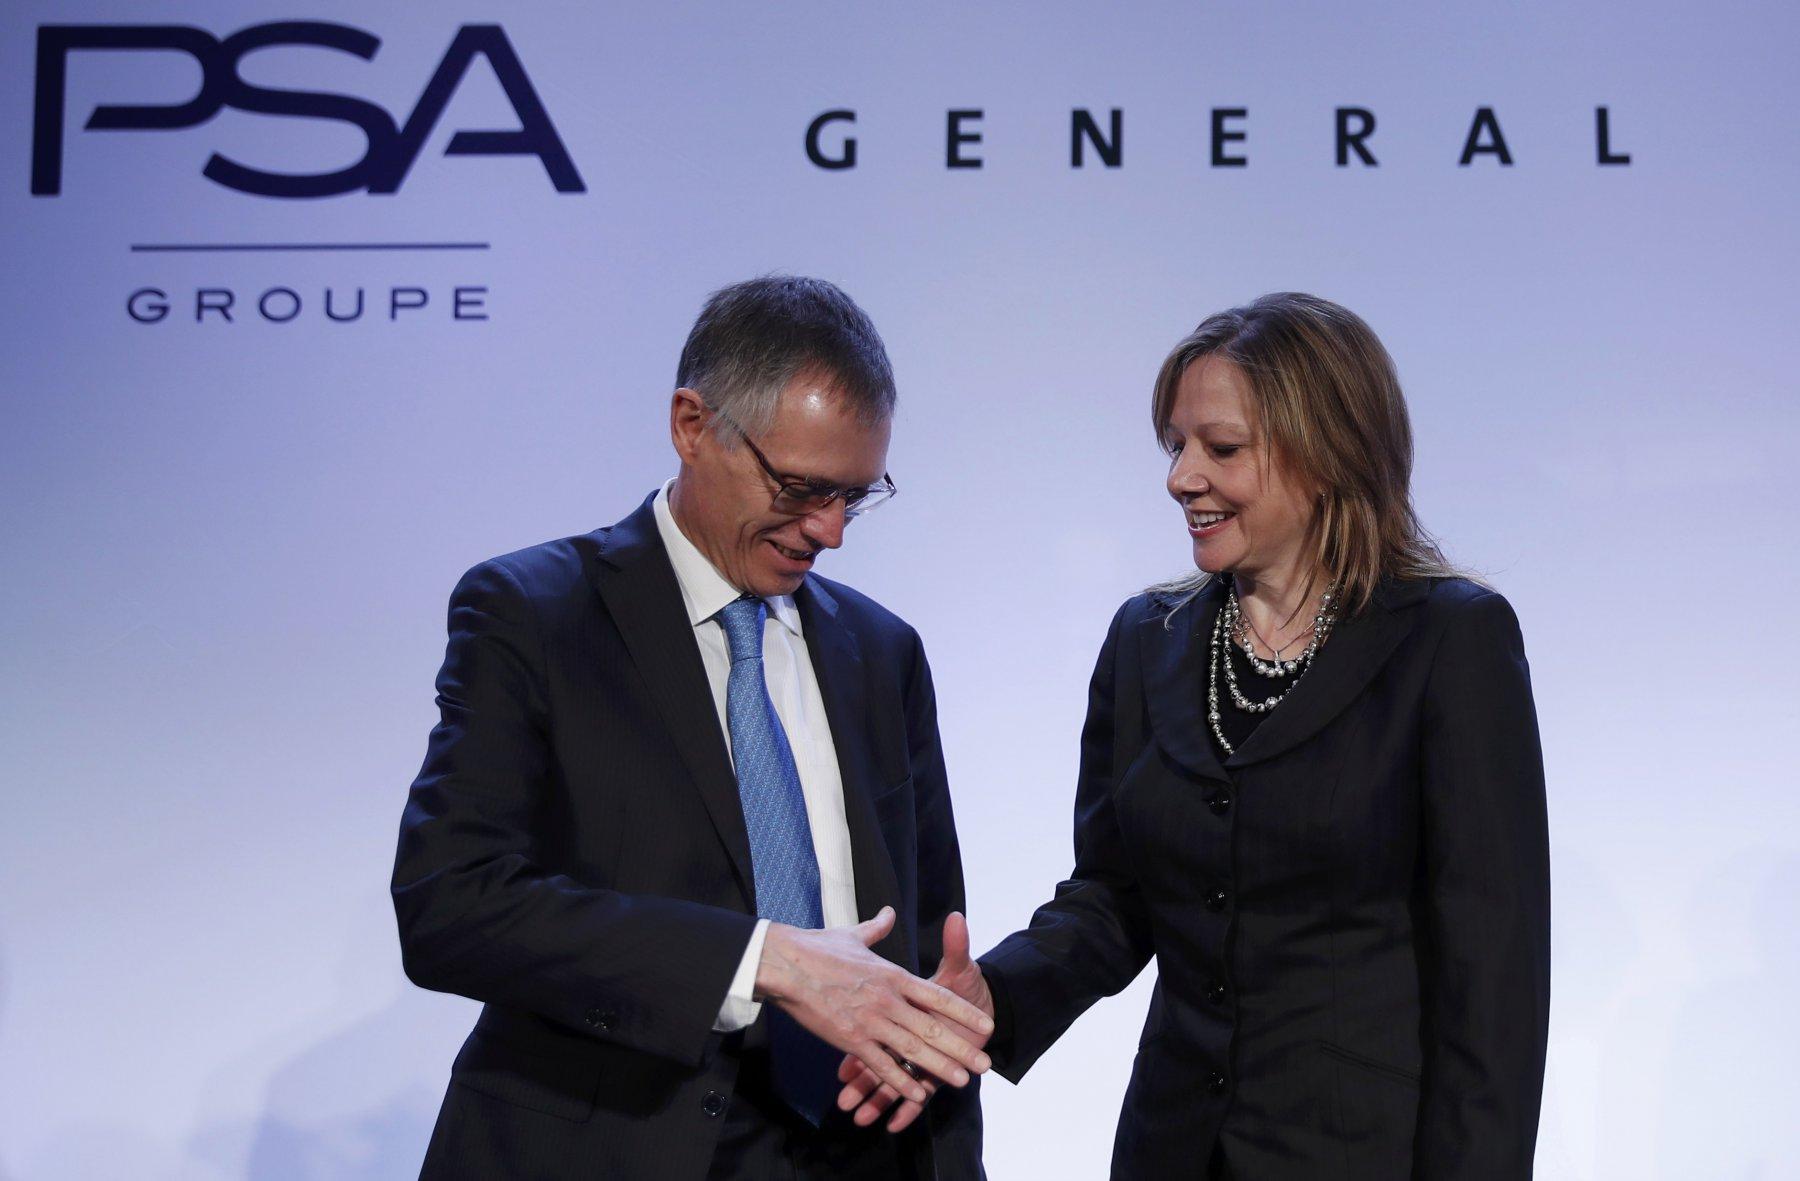 PSA-topman Carlos Tavares en General Motors-directeur Mary Barra. Fotocredit: Reuters / Christian Hartmann